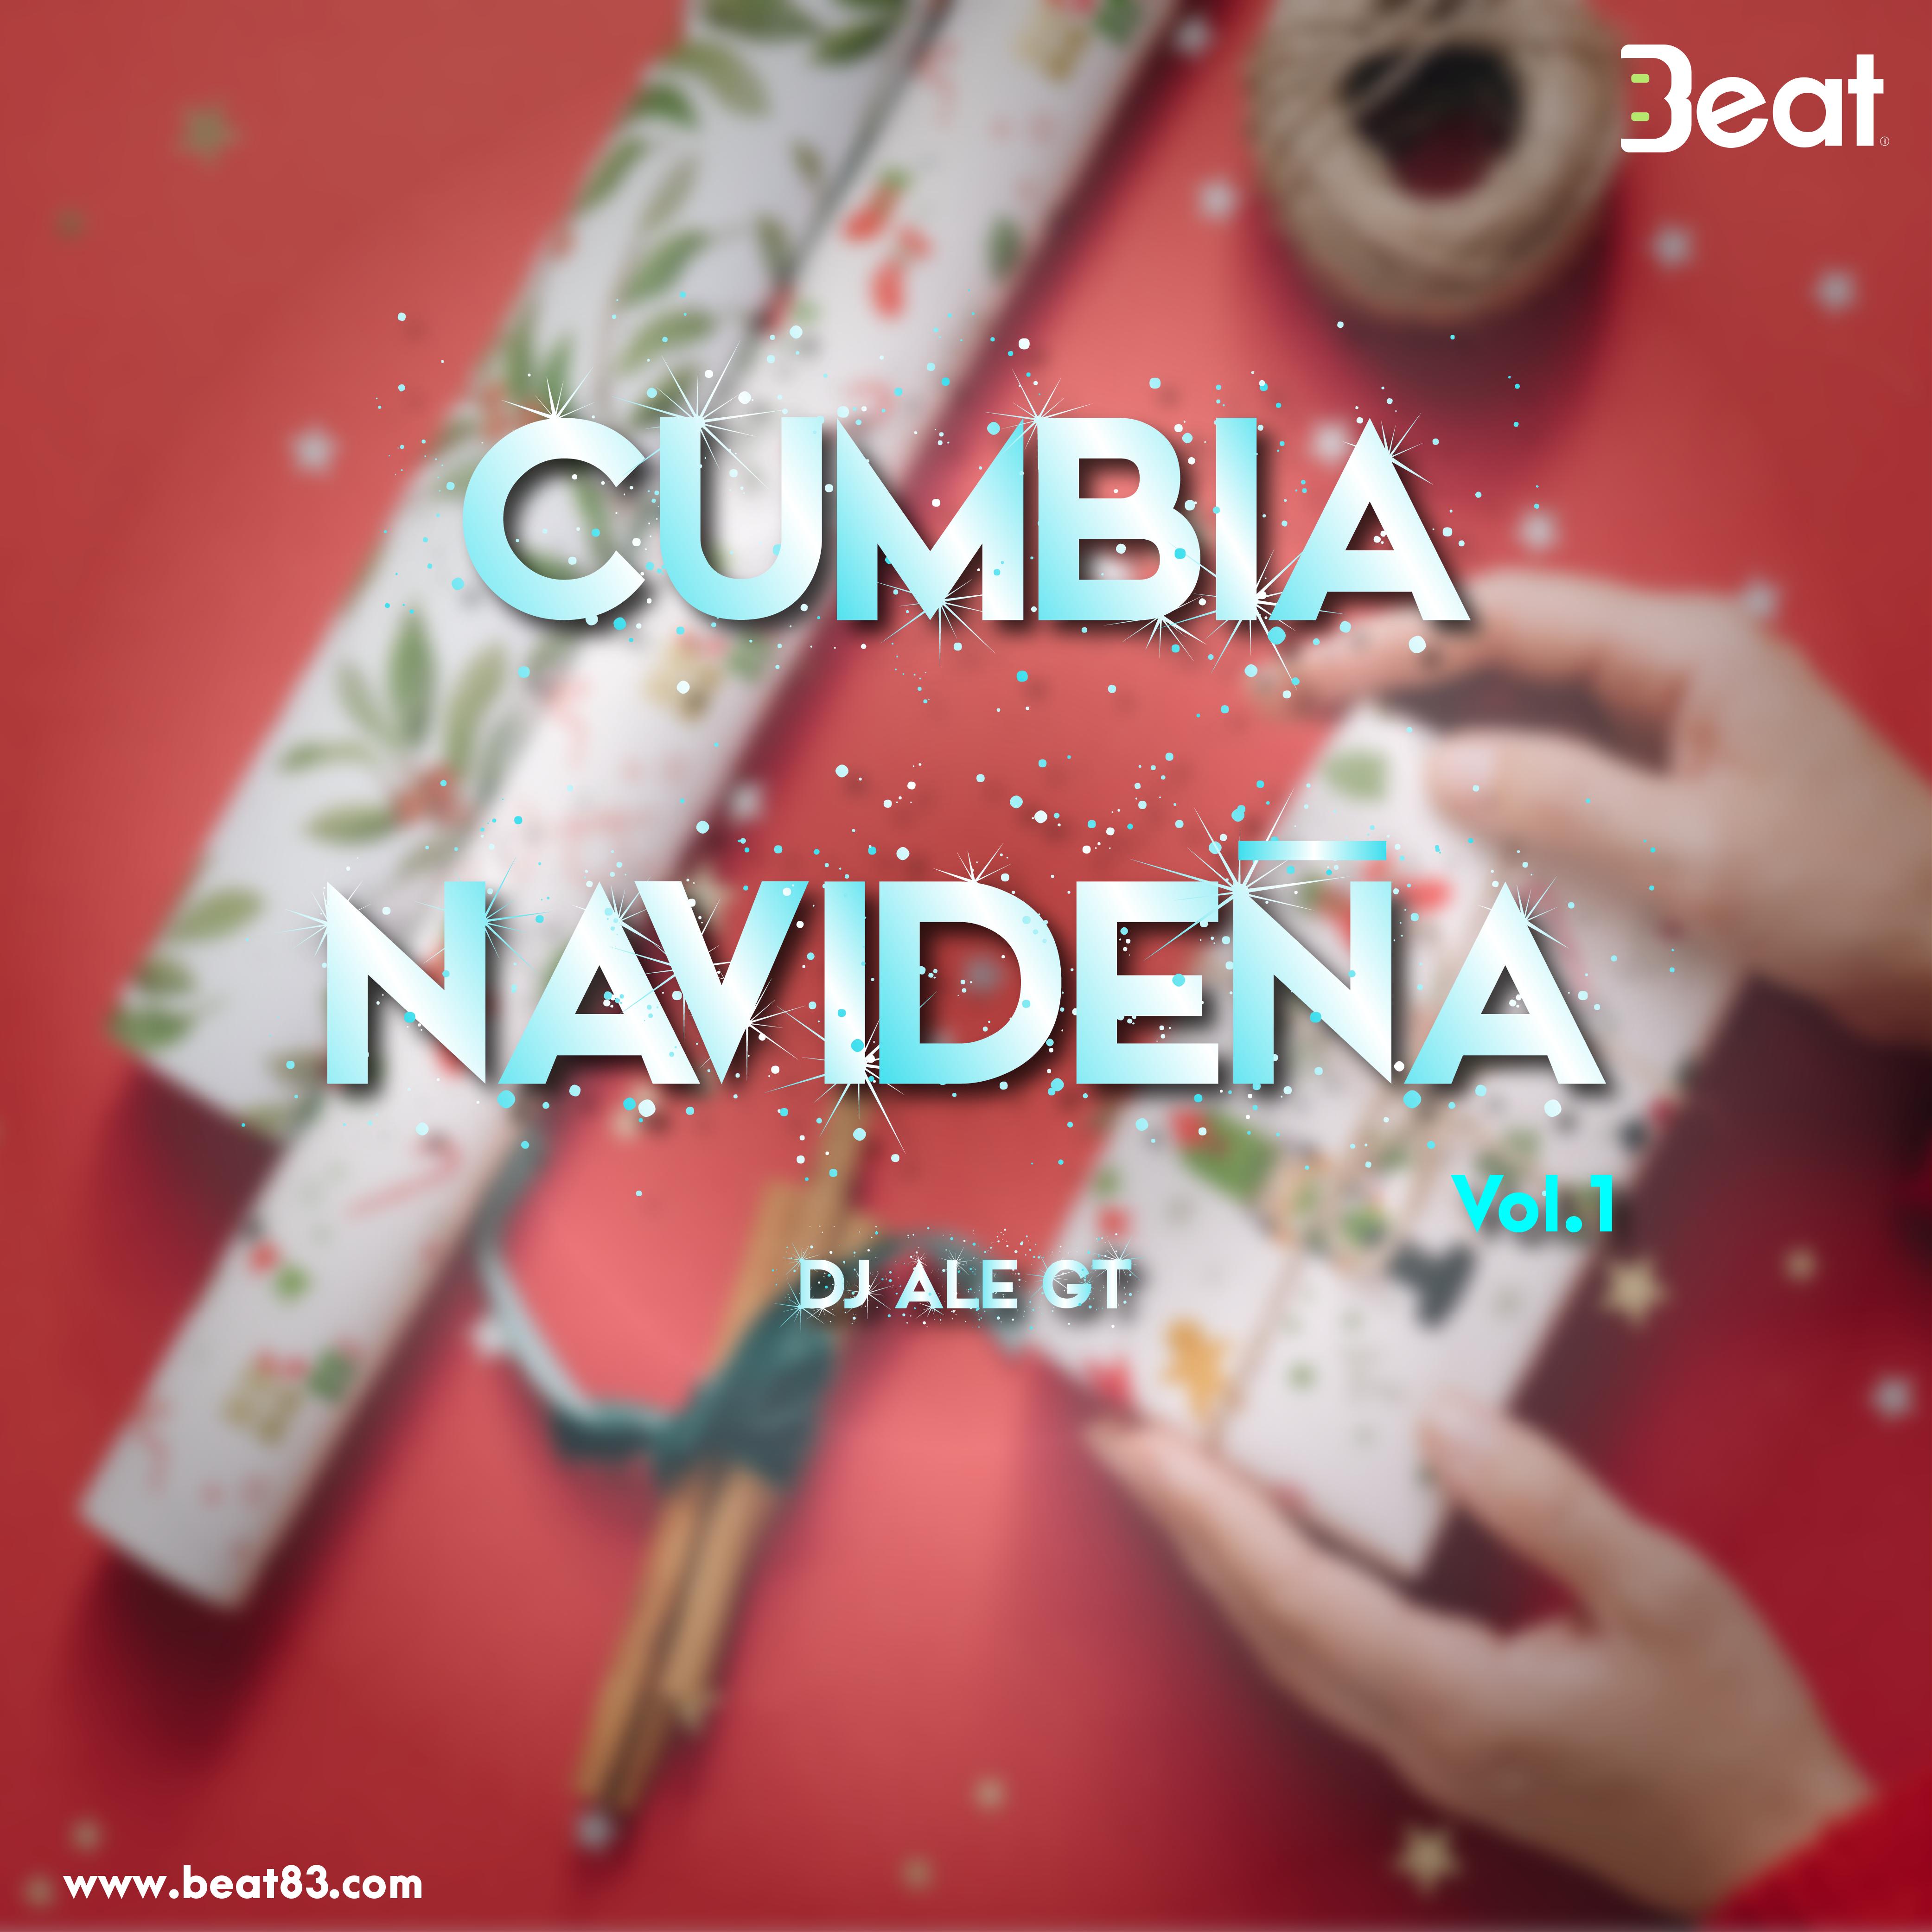 cumbia navideña cover art